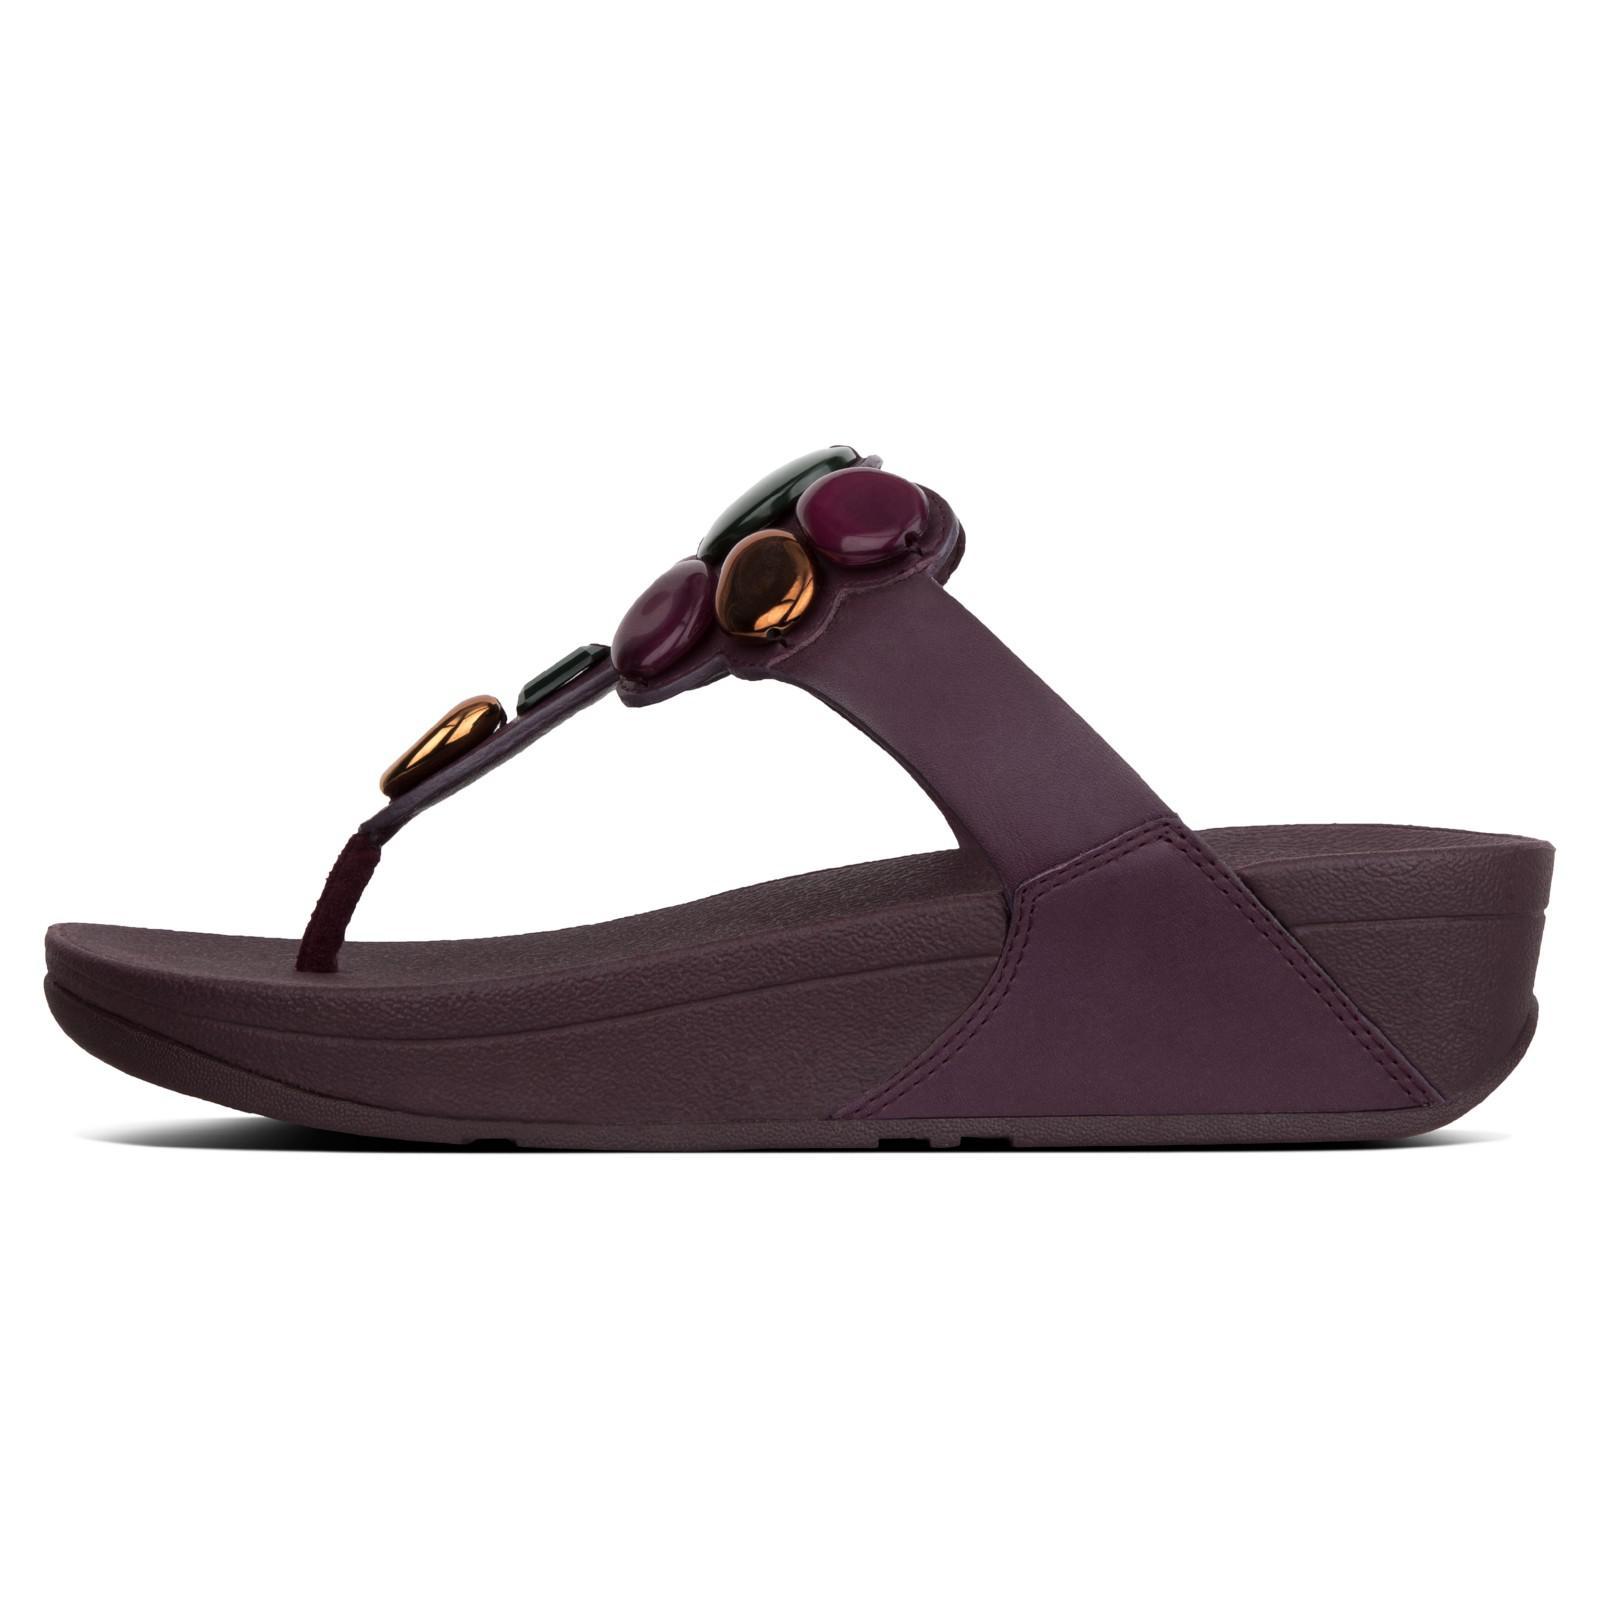 aa0fc54d6db Fitflop Honeybee Jewelled Toe Post Sandals in Purple - Lyst